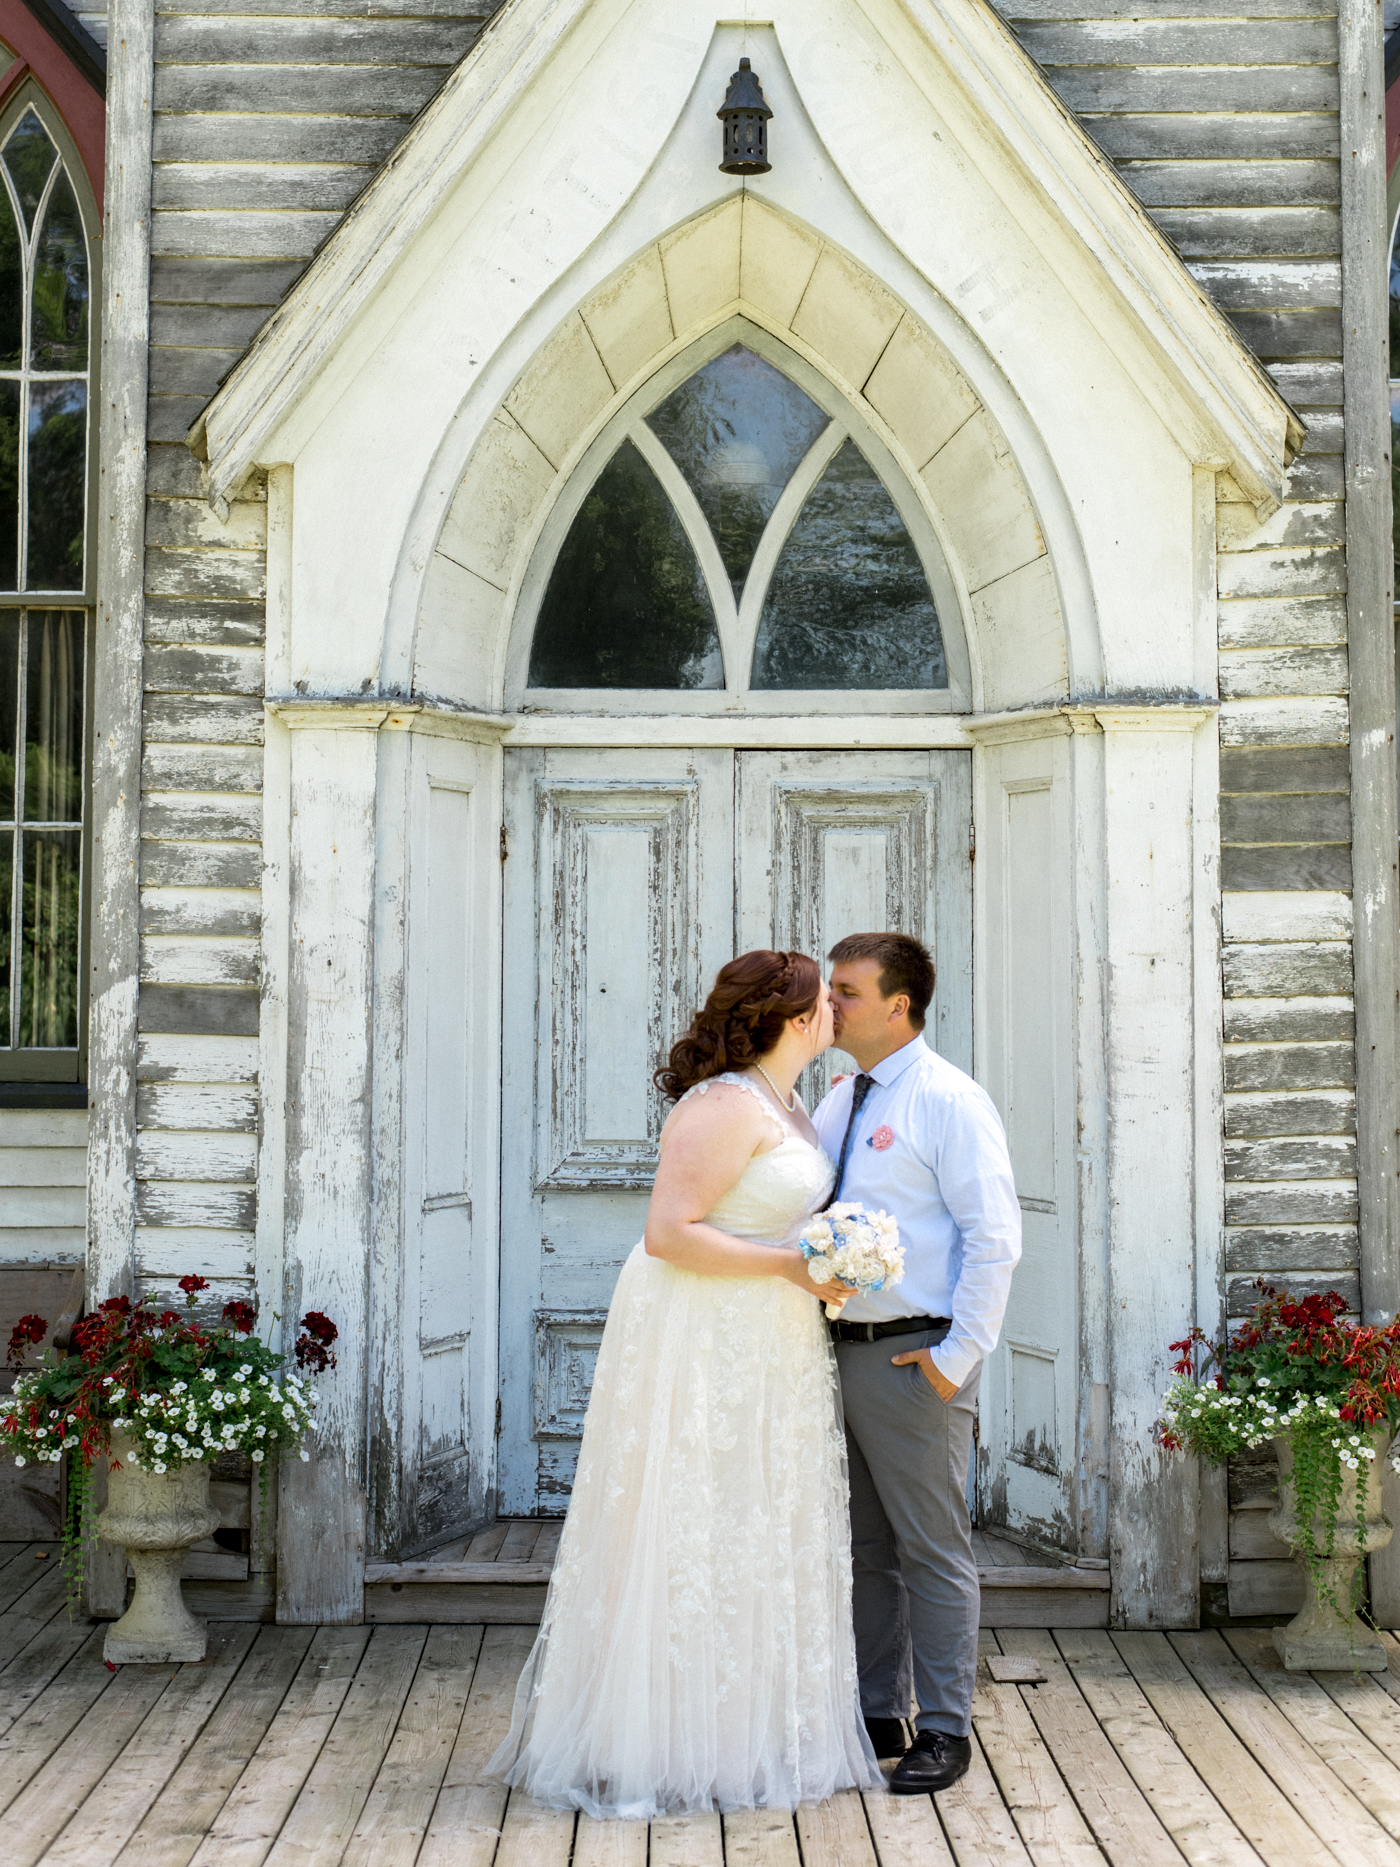 Chris & Carrie's Cranberry Creek Simcoe Port Dover Wedding Church Outdoor Summer Bright Hamilton Wedding Photography Niagara Aidan Hennebry Hush Hush Photography & Film-11.jpg